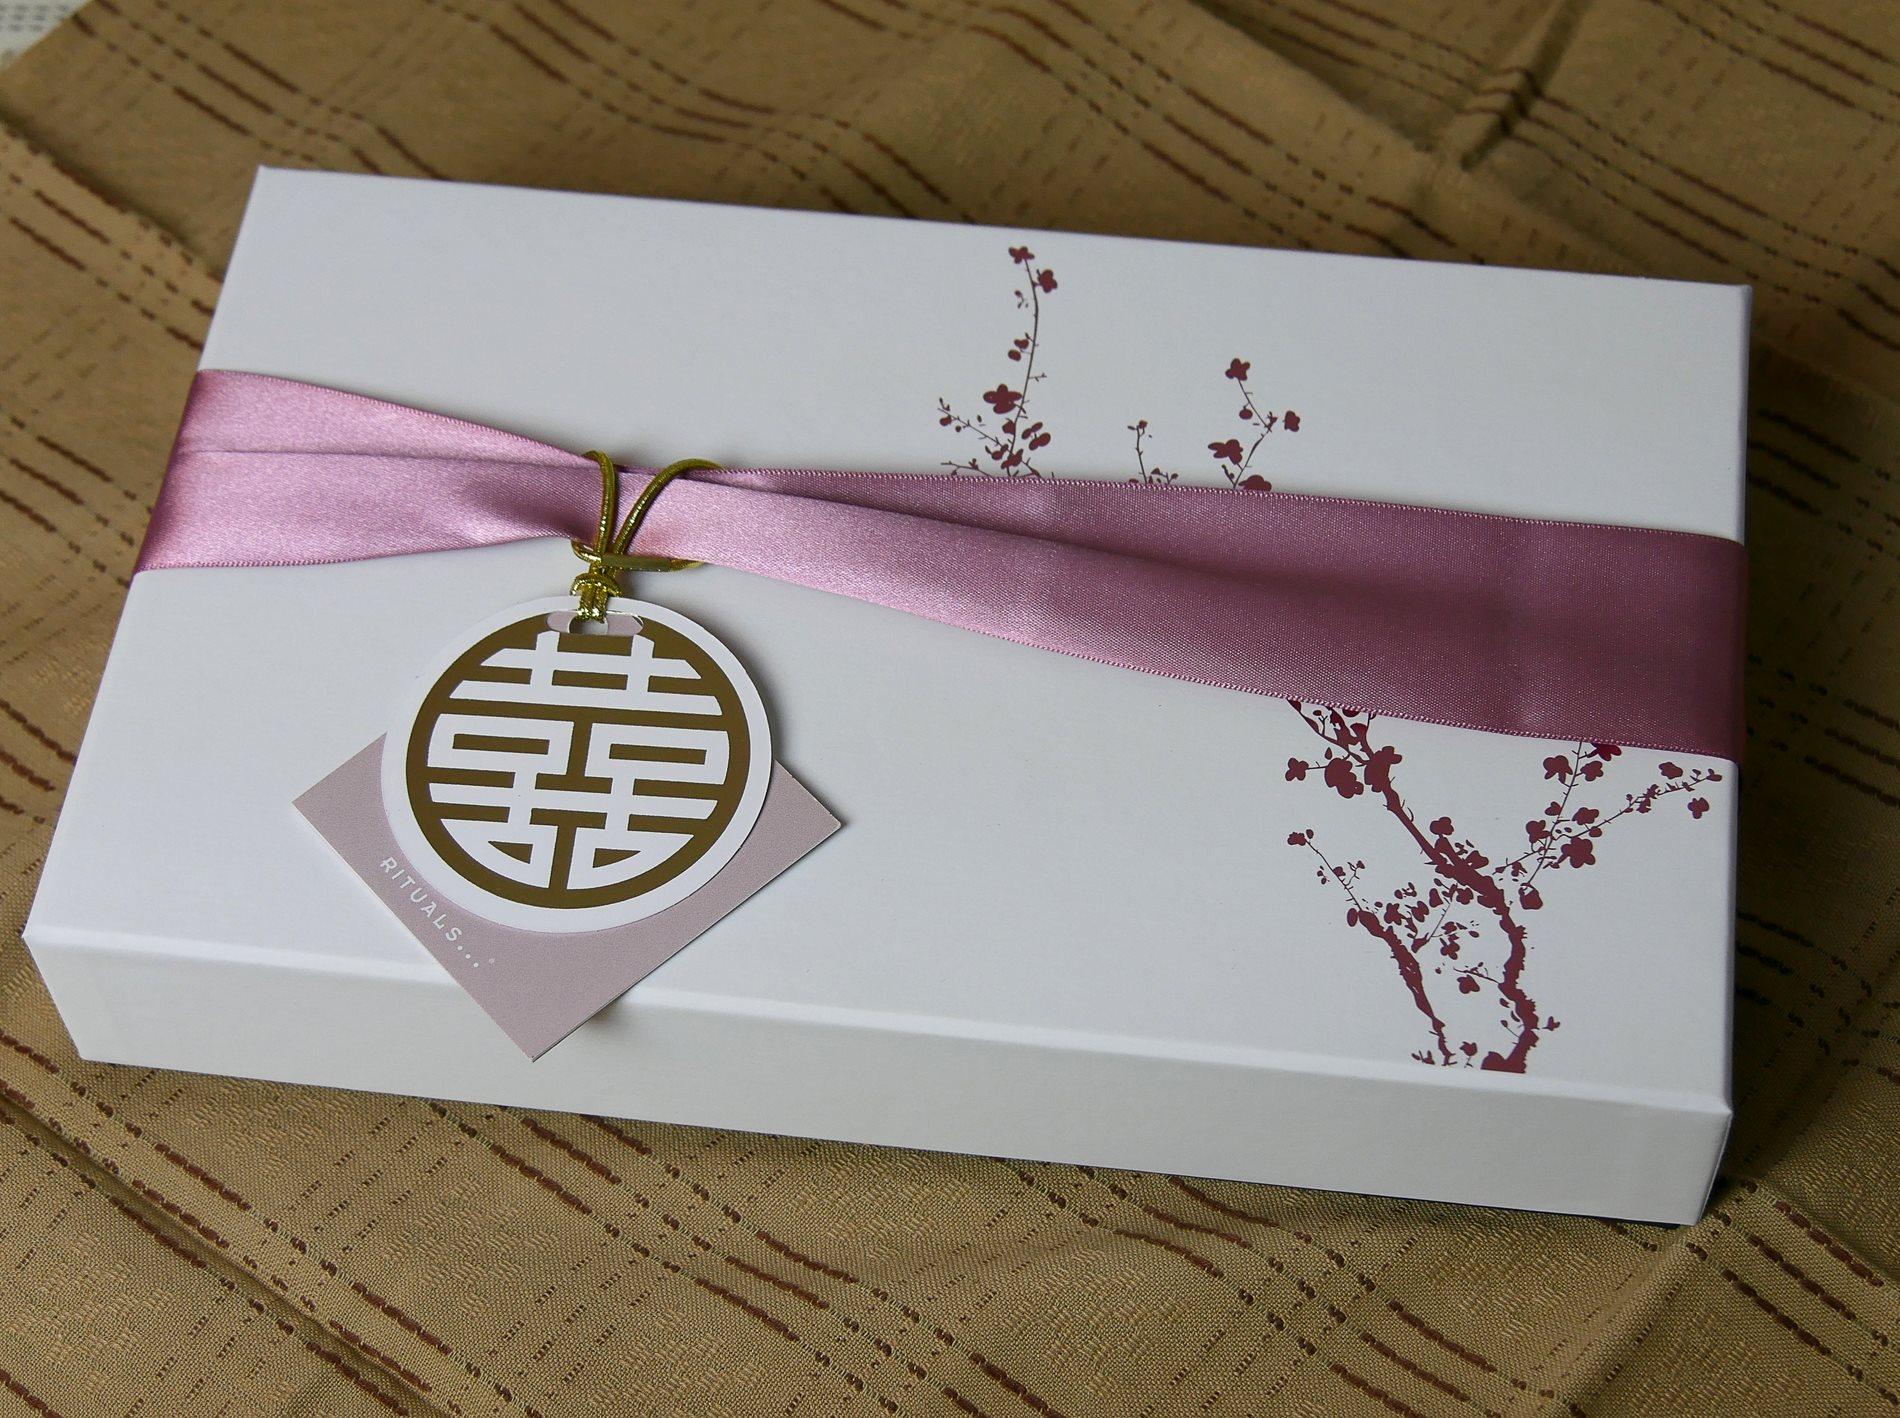 coffret ritual of sakura - juliesliberties